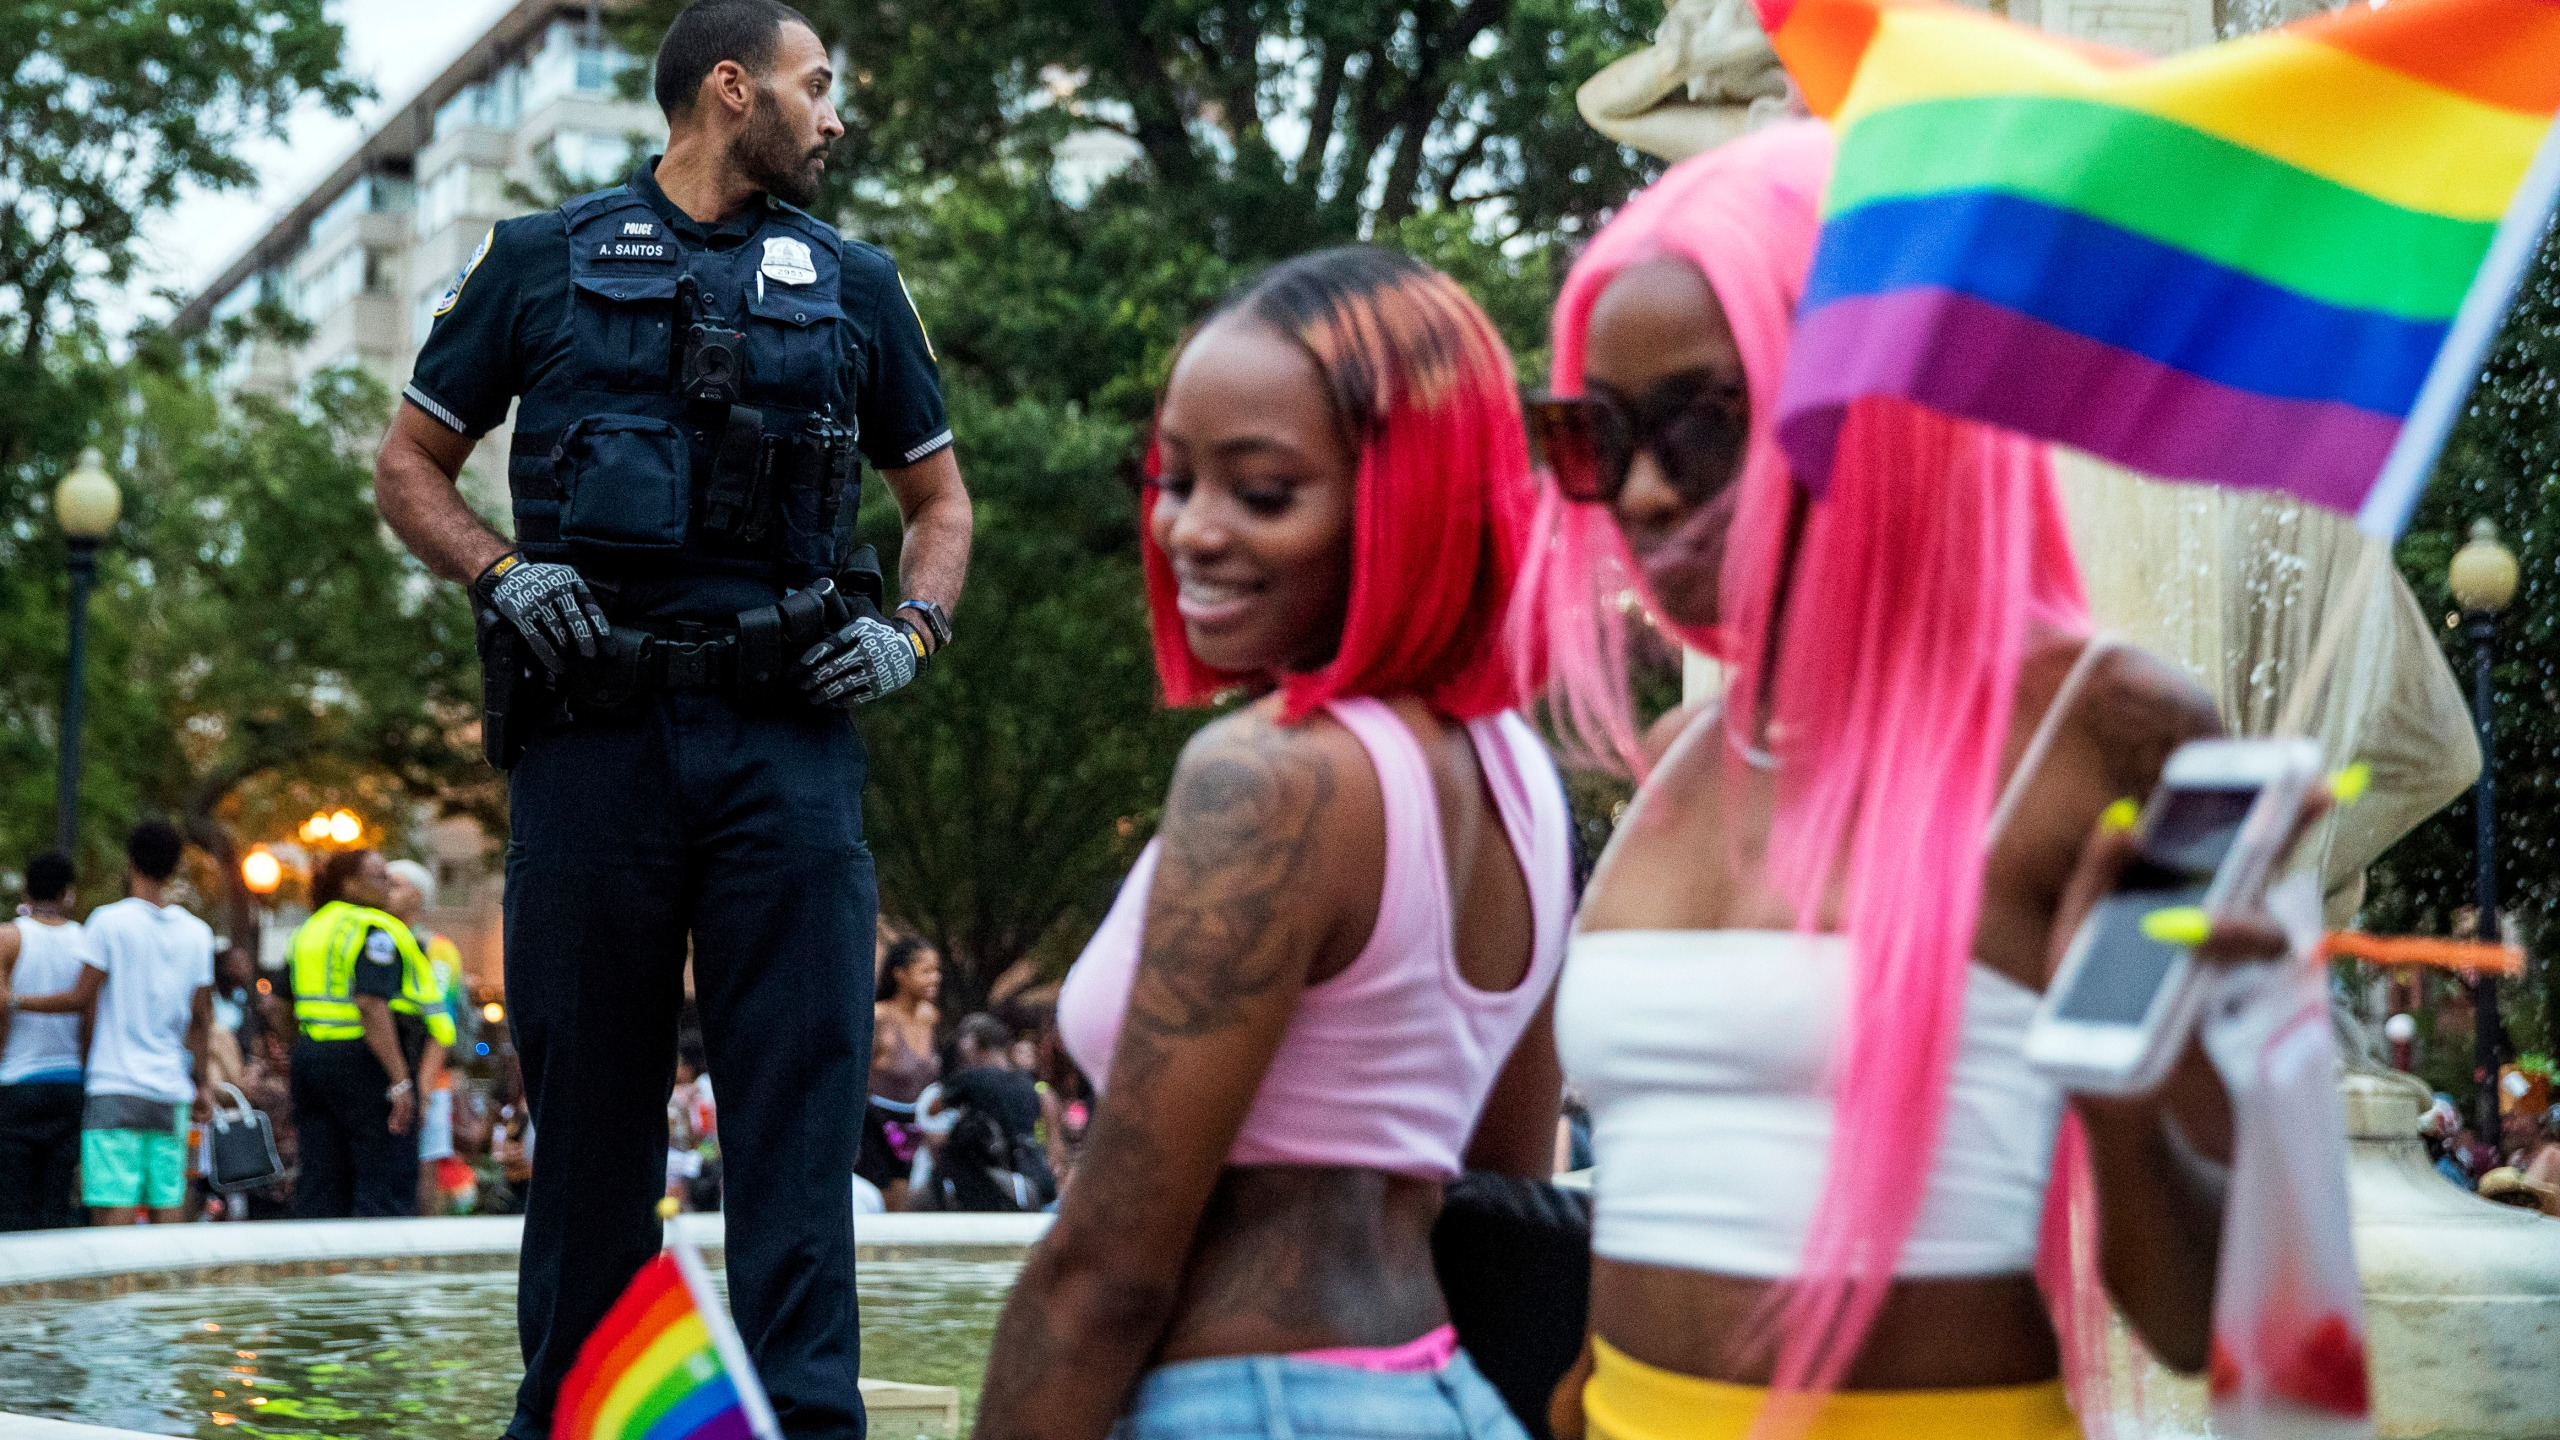 Capitol_Pride_Parade_52879-159532.jpg69923061